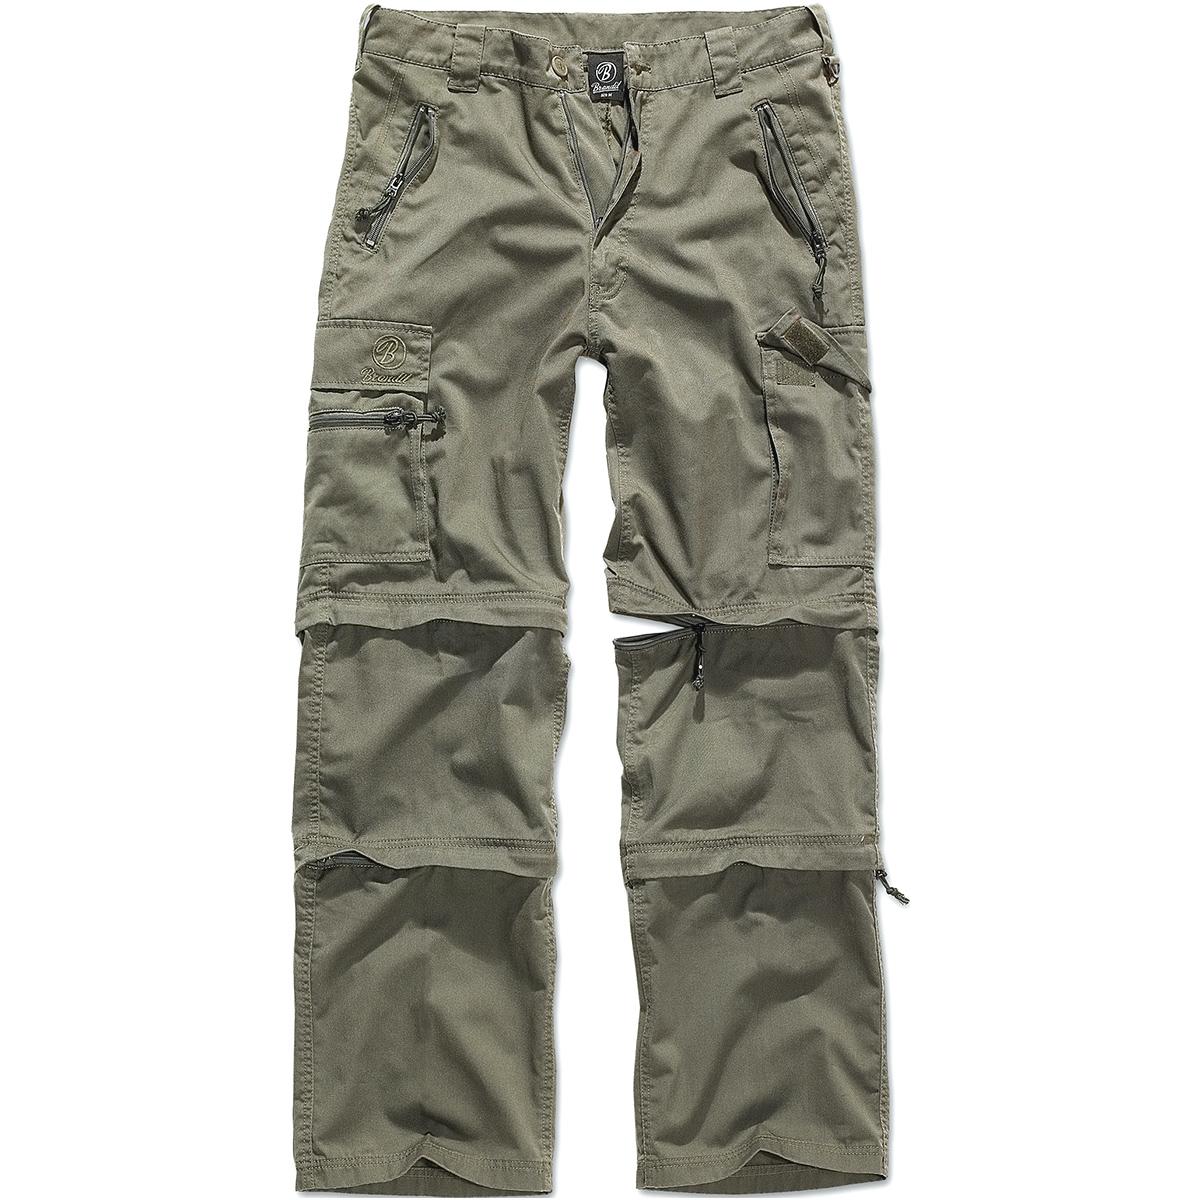 brandit savannah pantaloni verde oliva  Brandit Savannah 3 In 1 Trekking Pantaloni Escursionismo Shorts Di ...